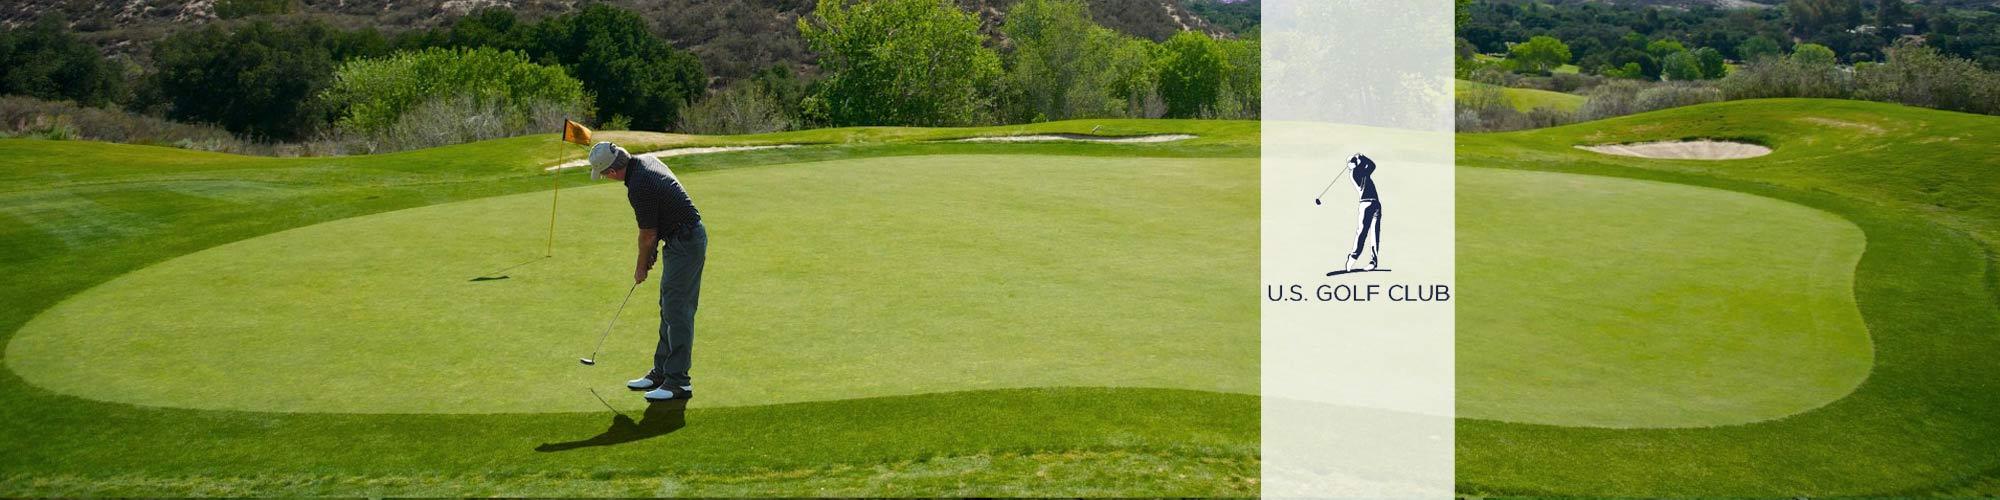 2u.s.-golf-club